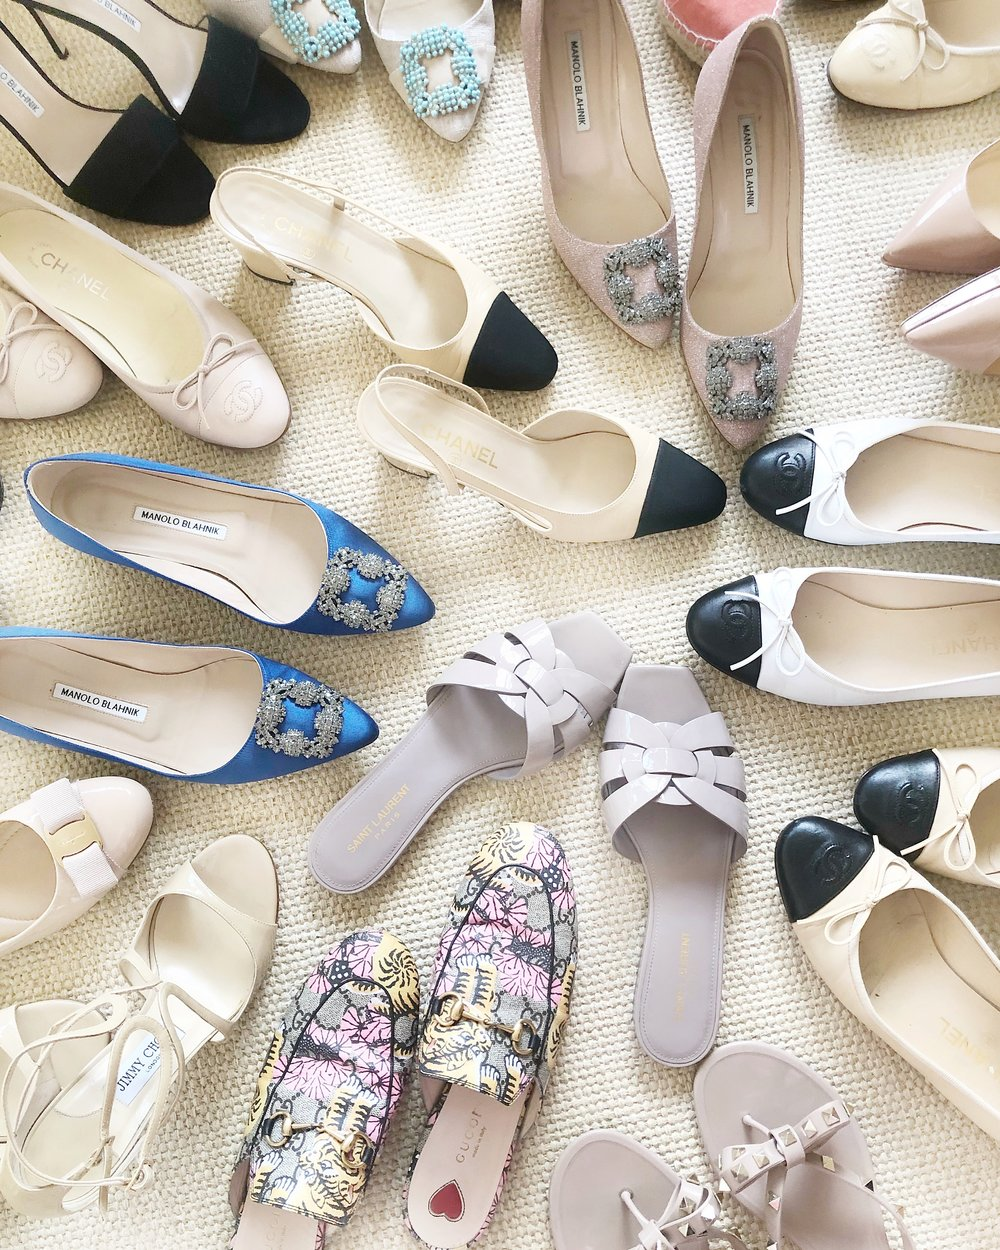 Manolo Blannik Hangisi Flat, YSL Tribute Flat, Chanel Slingback Chanel Ballet Flat Designer Shoes